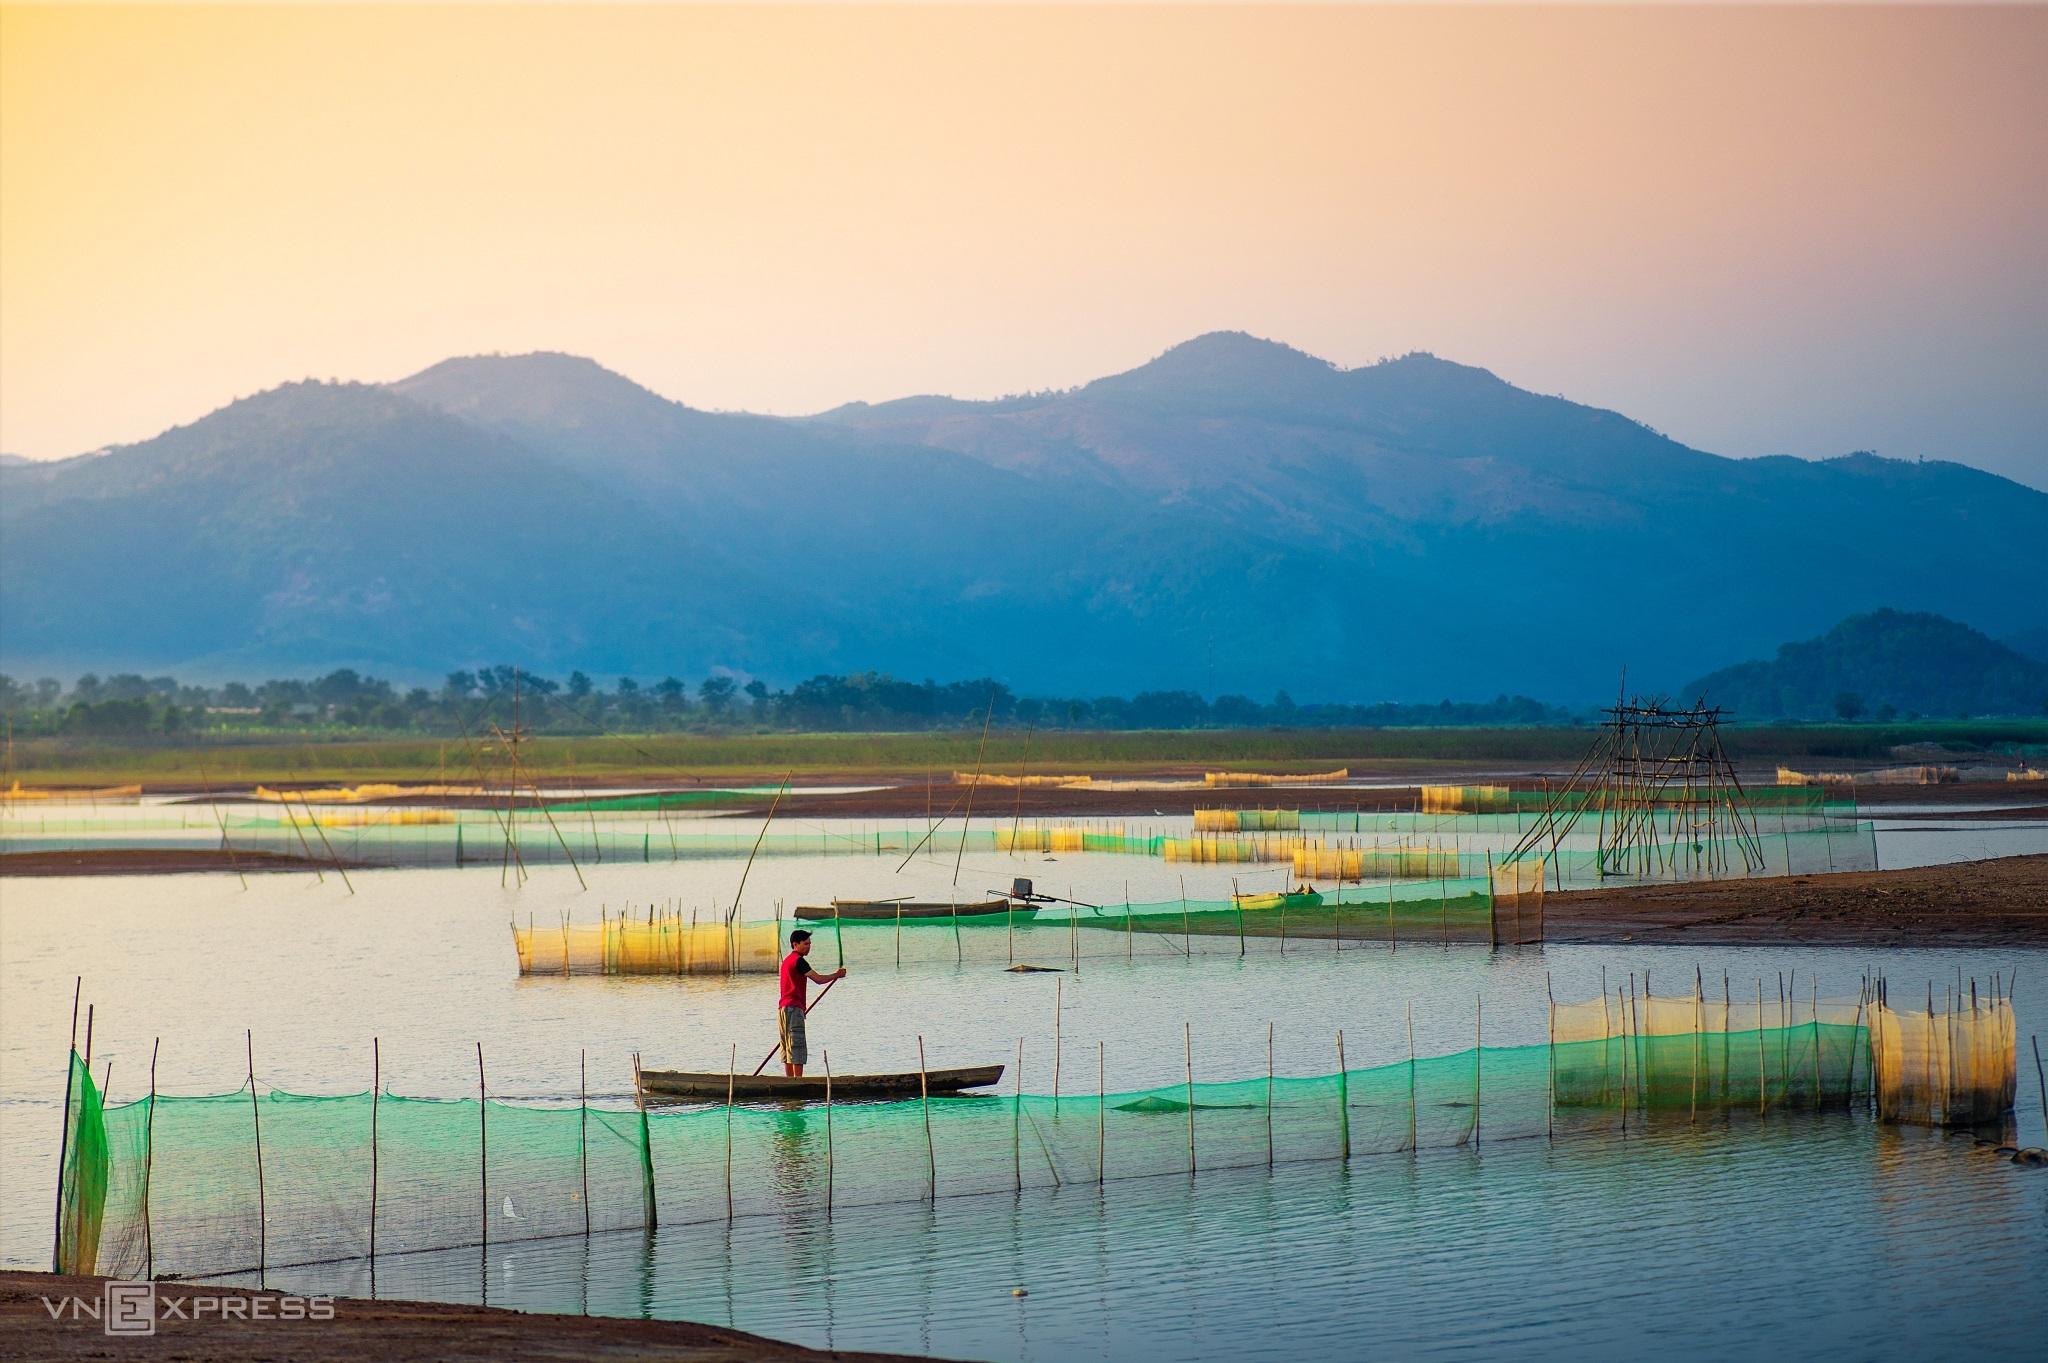 Gia Lai, a hidden Central Highlands gem